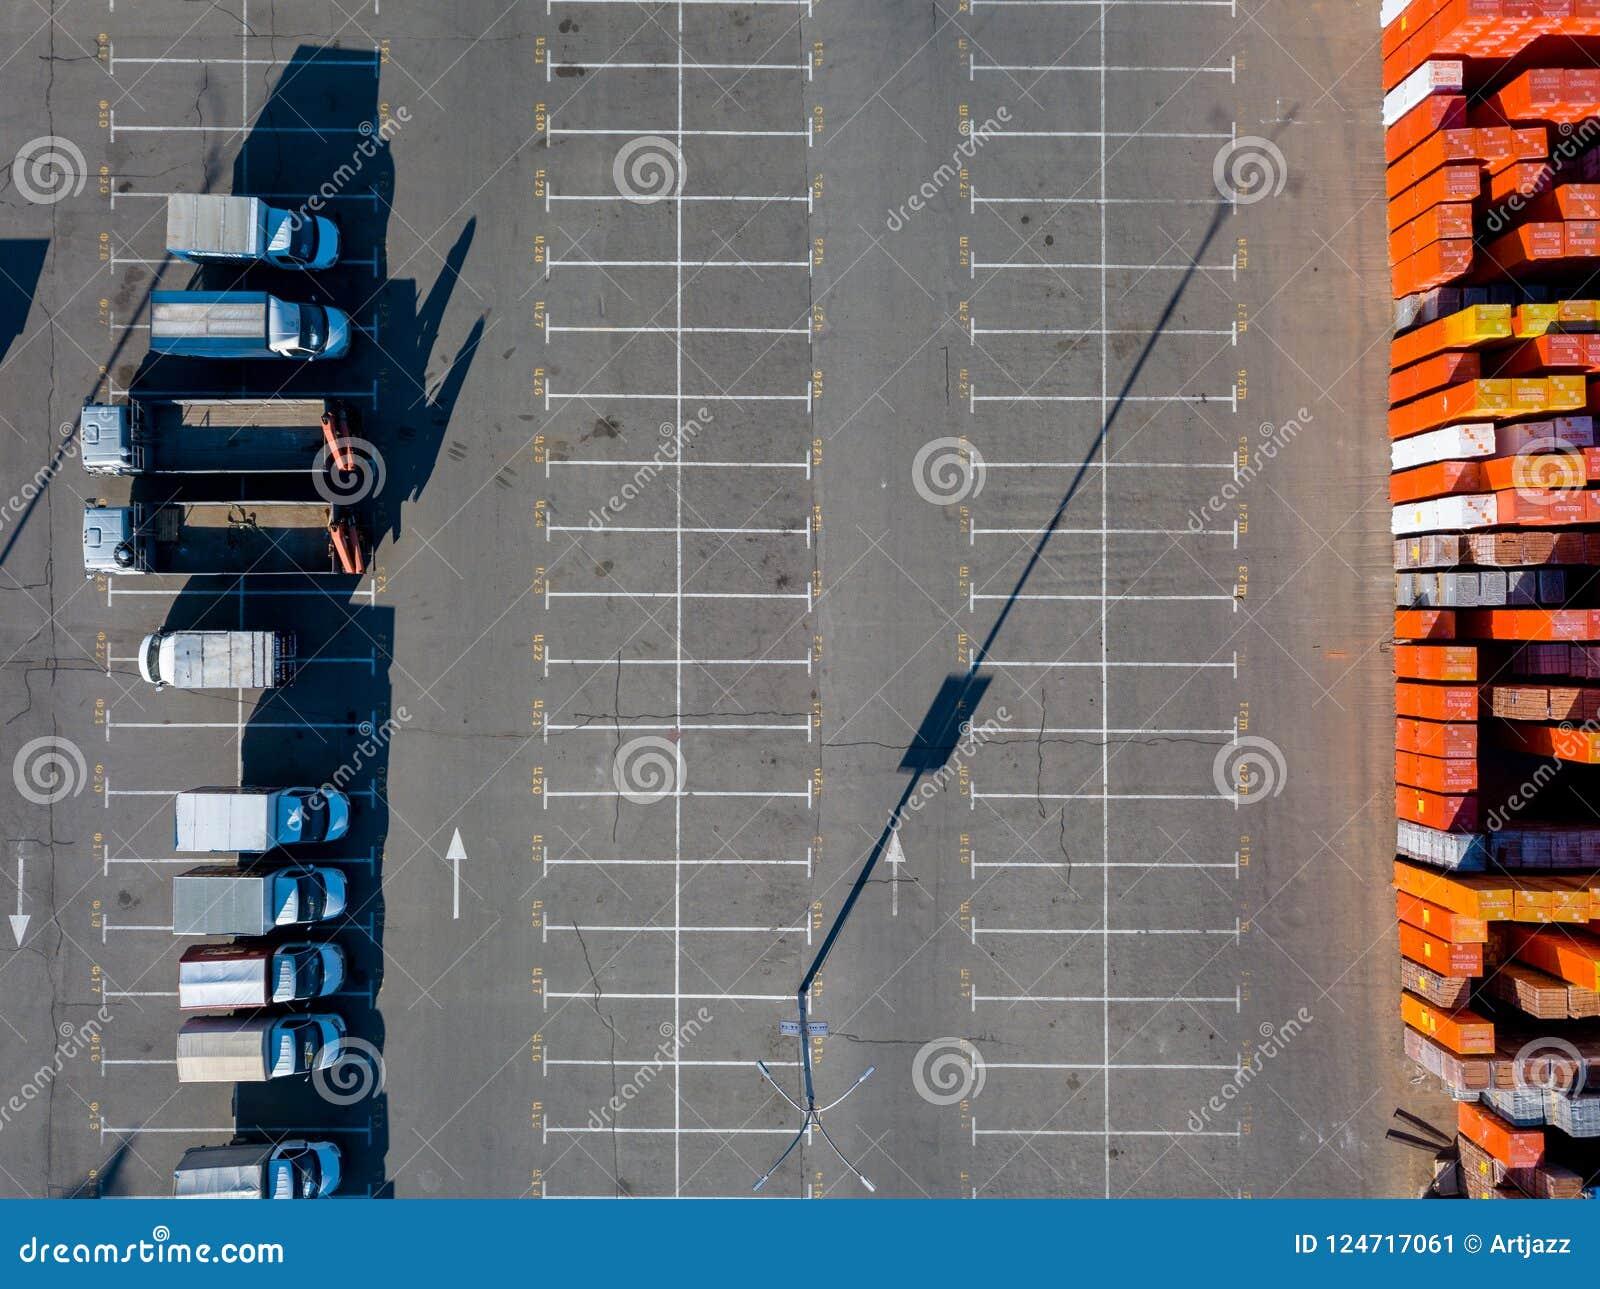 Ukraine, Kiev. April 08, 2018. Building store Epicentr K. Parking place, warehouse storage of building materials and